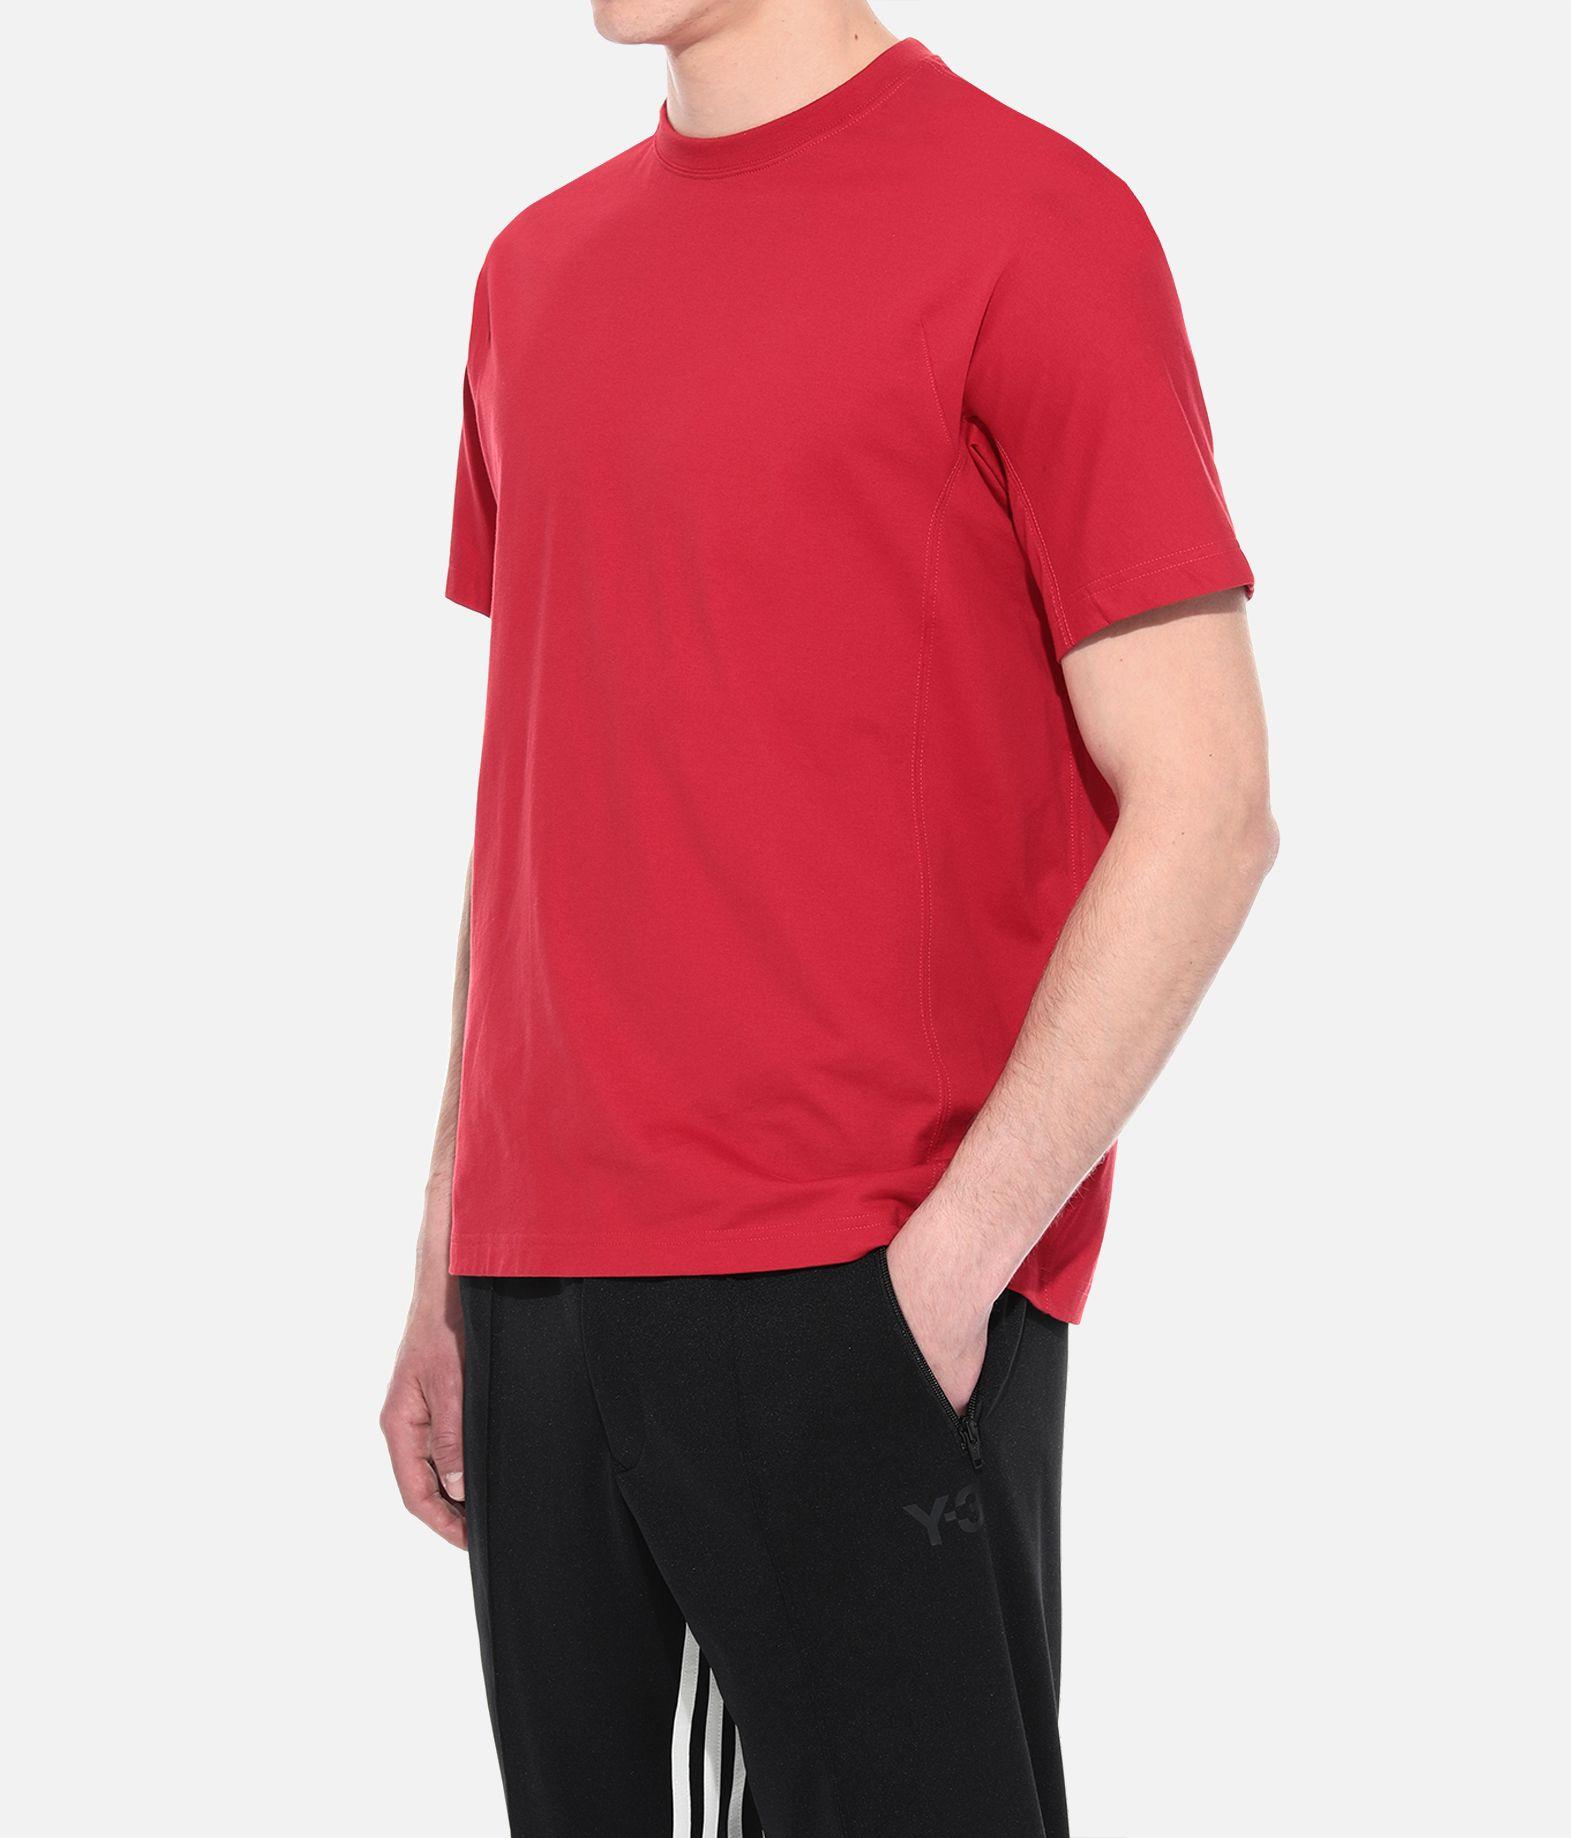 Y-3 Y-3 Classic Crewneck Tee Short sleeve t-shirt Man e